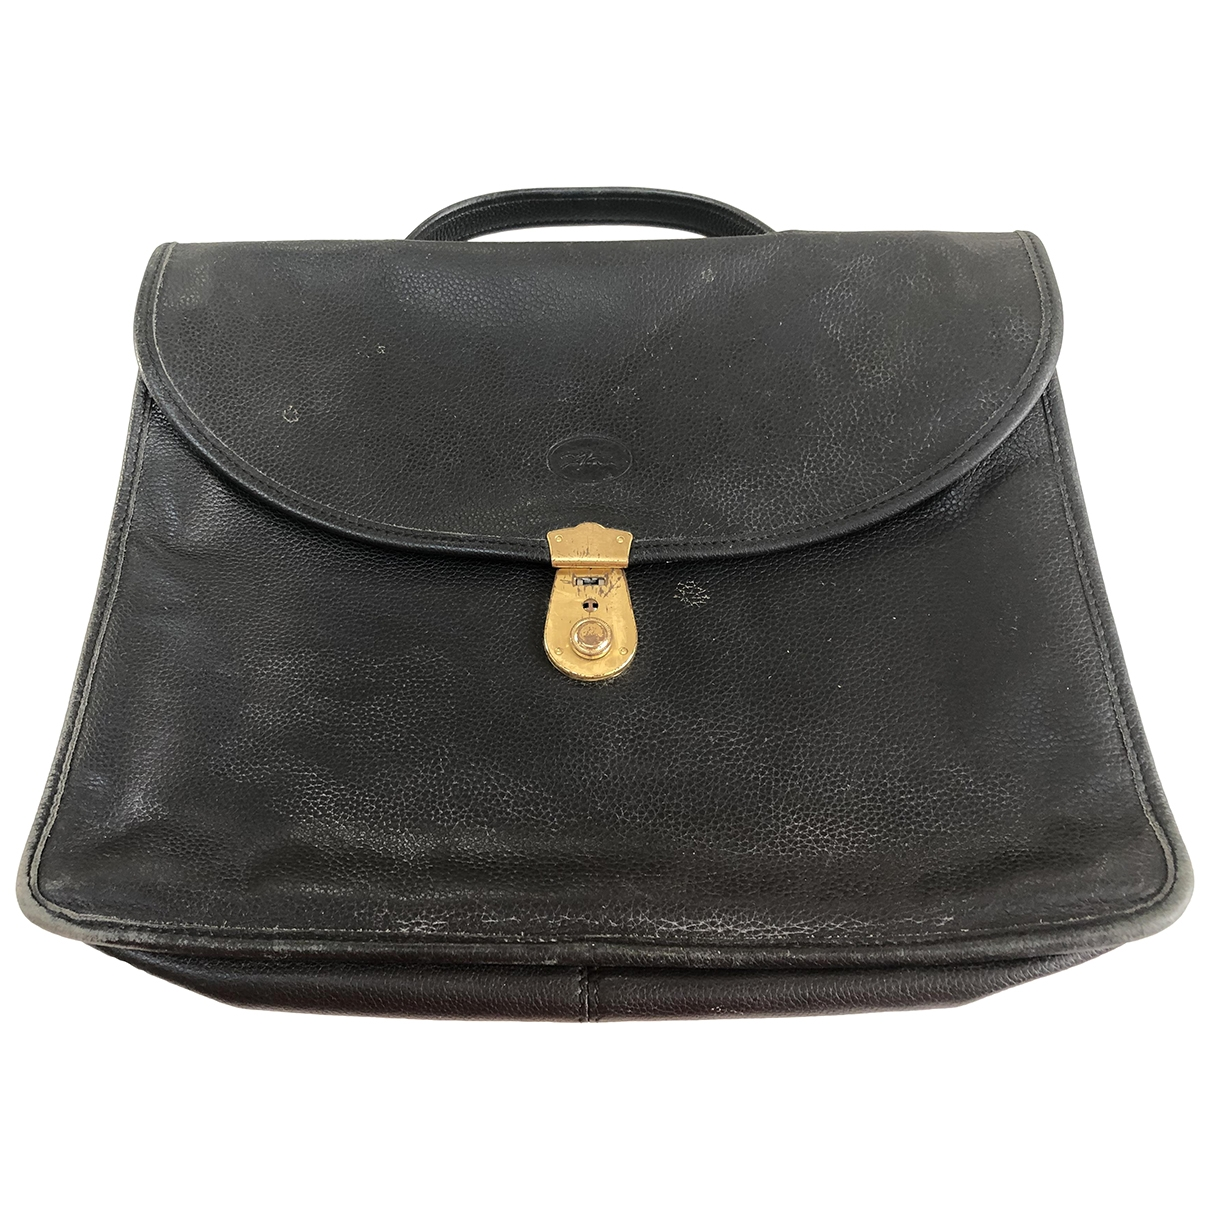 Longchamp \N Clutch in  Schwarz Leder